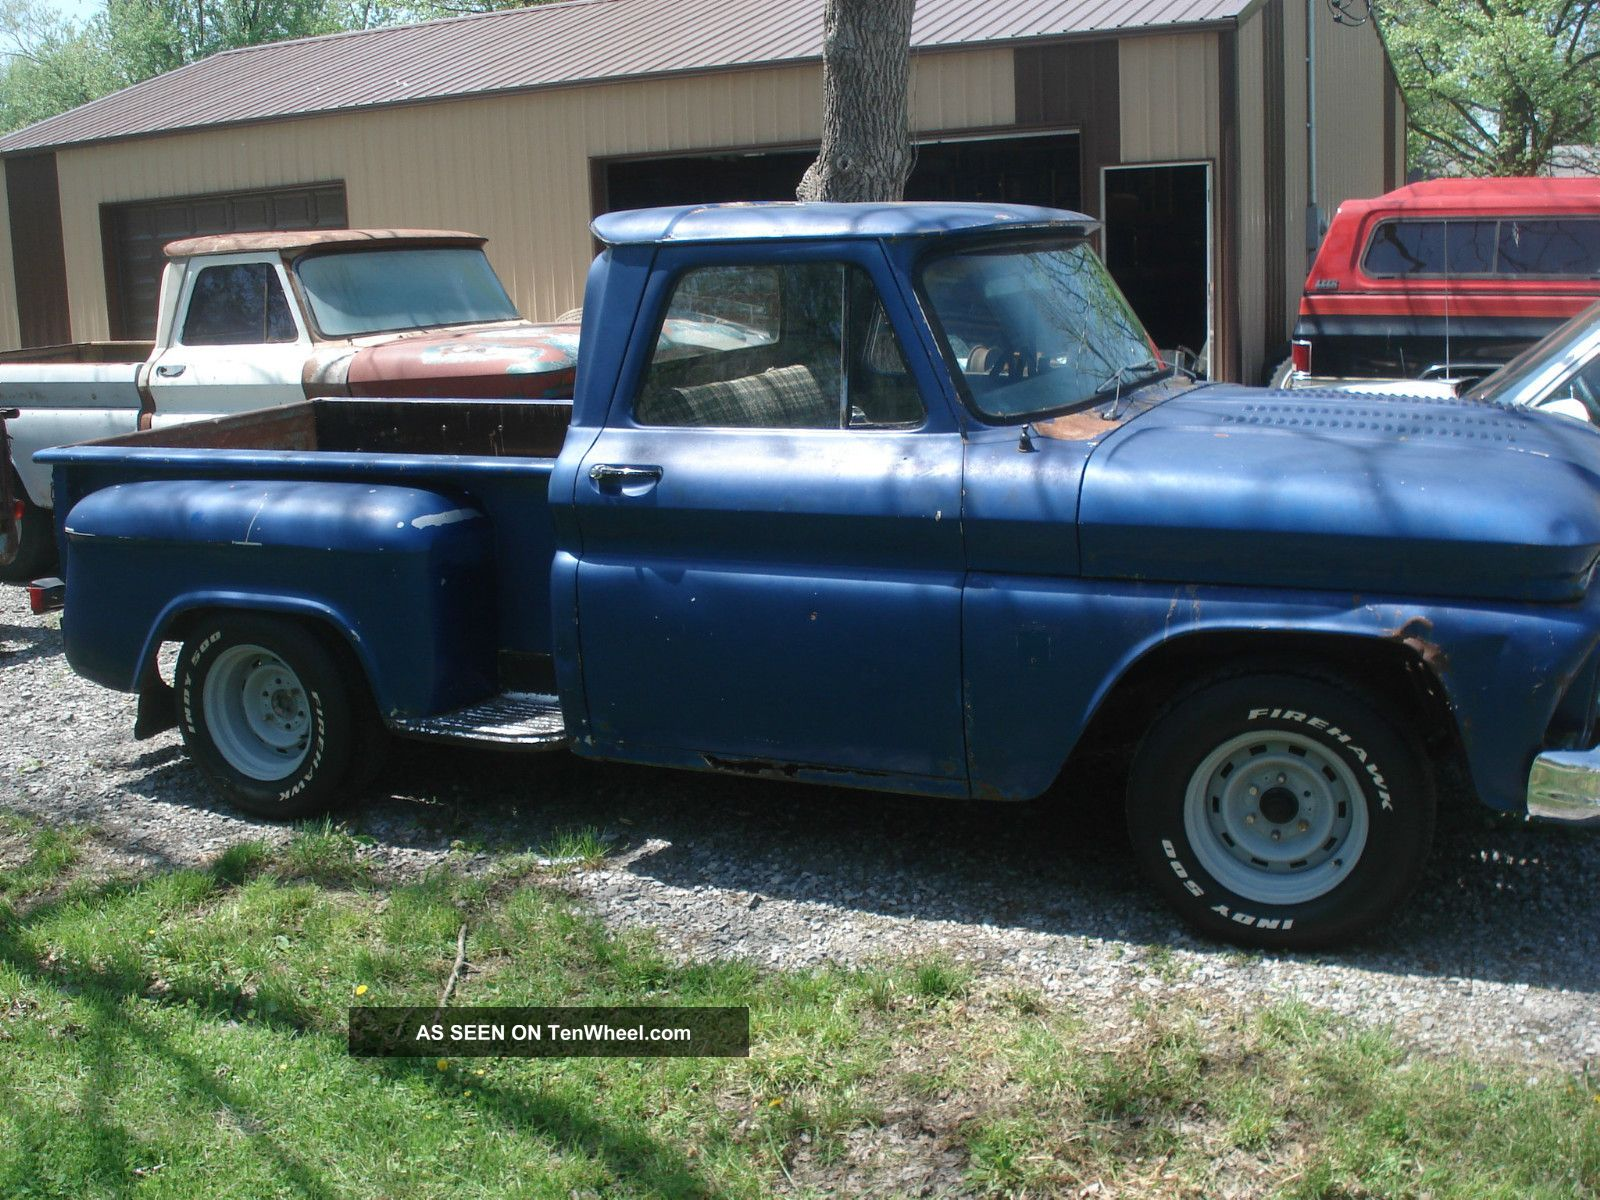 1966 Chevrolet 1 2 Ton Truck Short Bed Stepside Swb Project Pickup